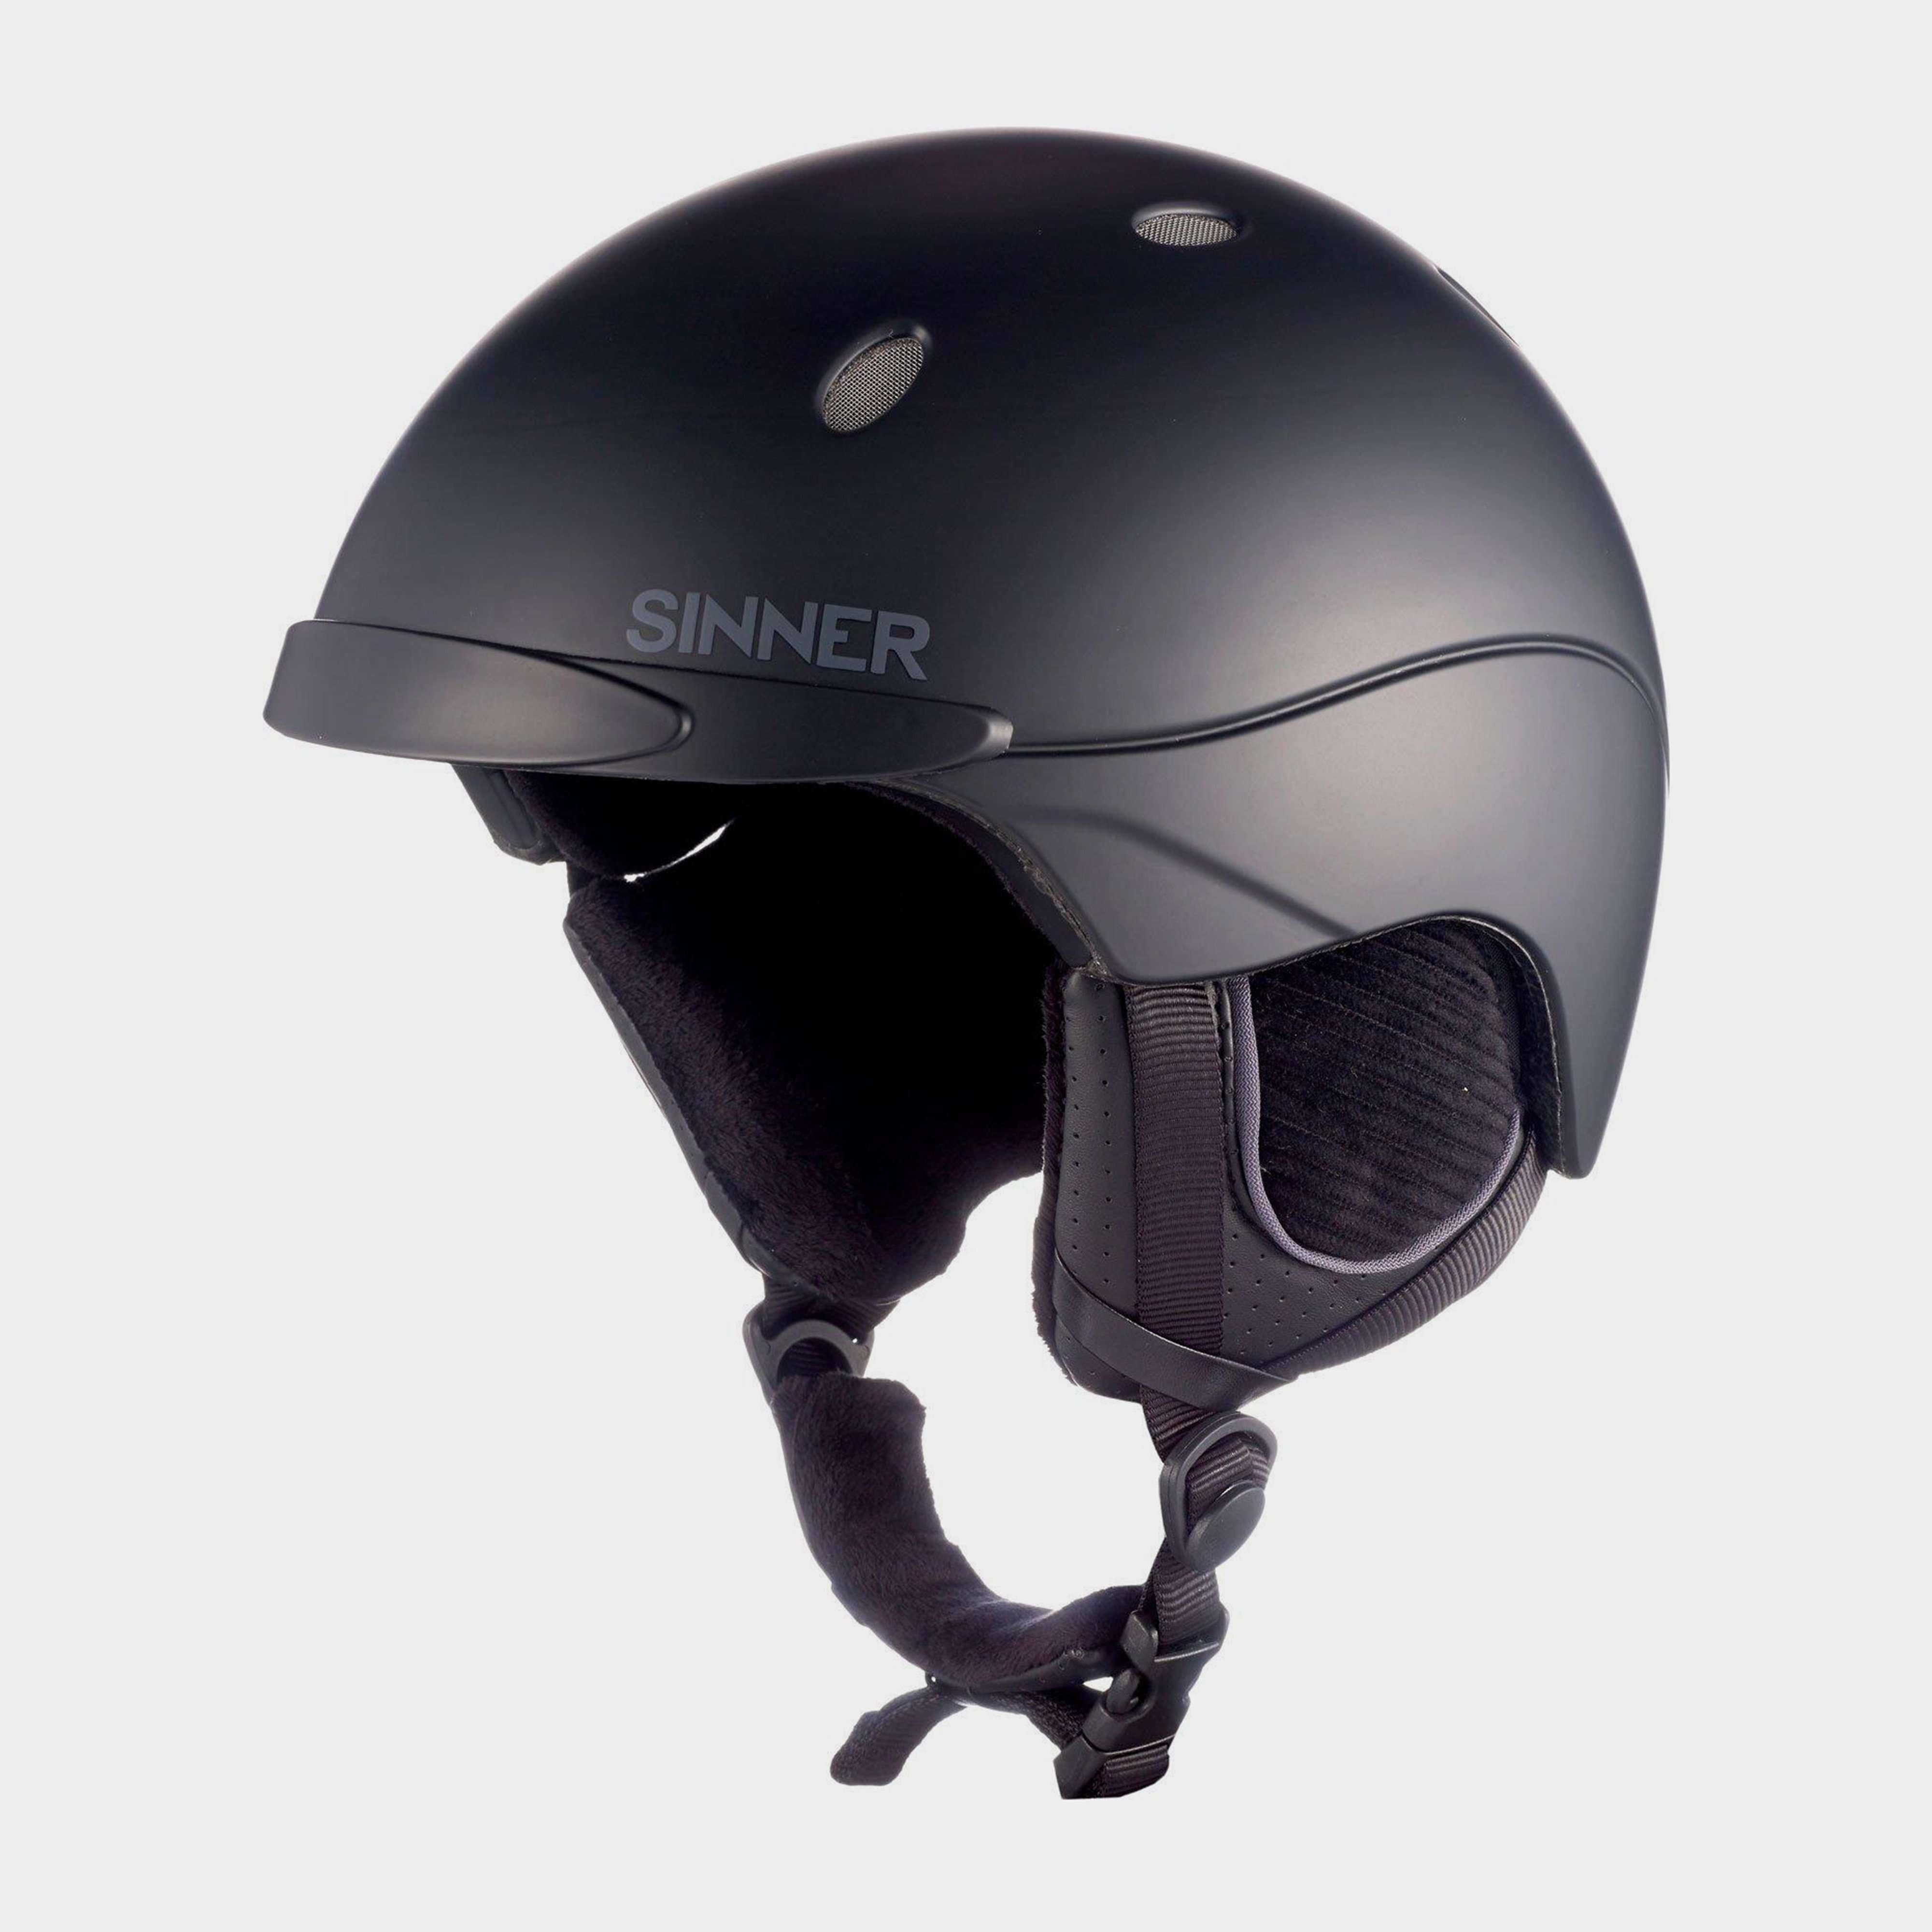 SINNER Titan Ski Helmet